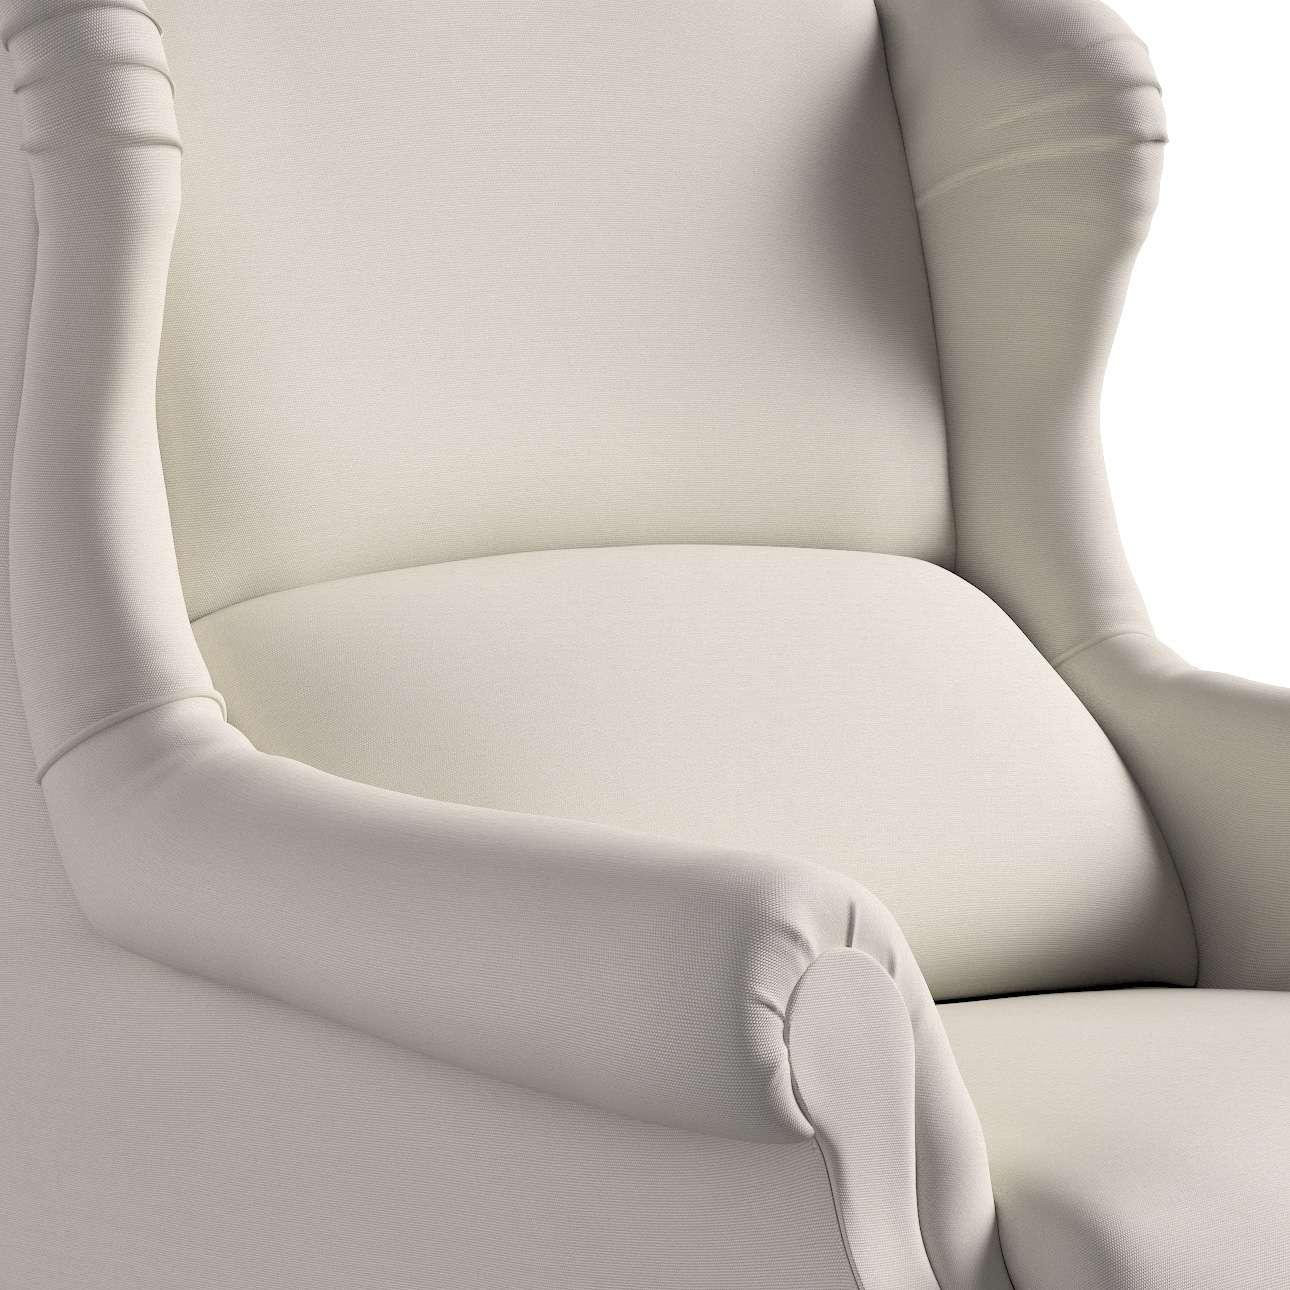 Fotel Unique w kolekcji Cotton Panama, tkanina: 702-31